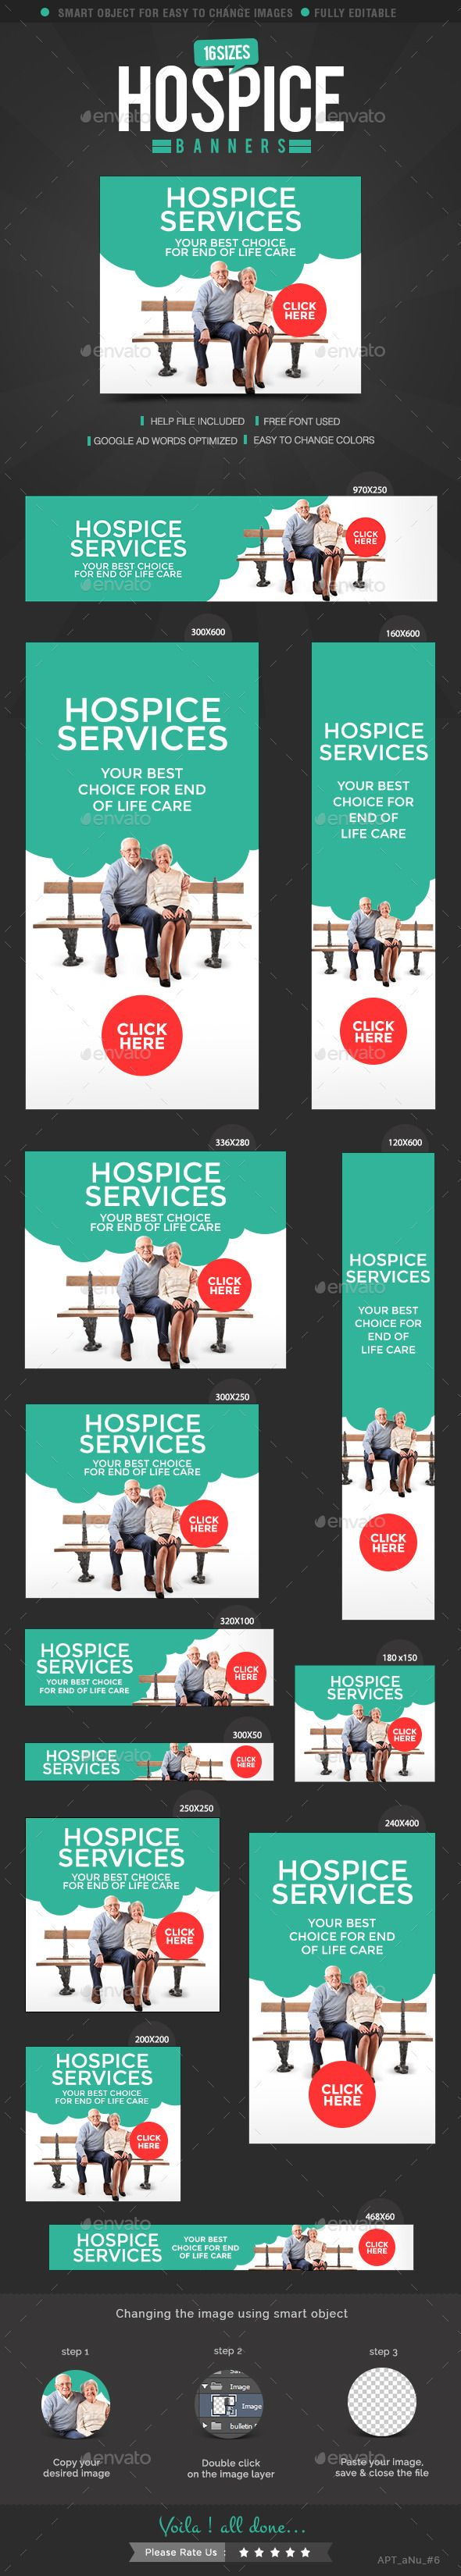 Hospice Care Web Banner Design Set Template PSD